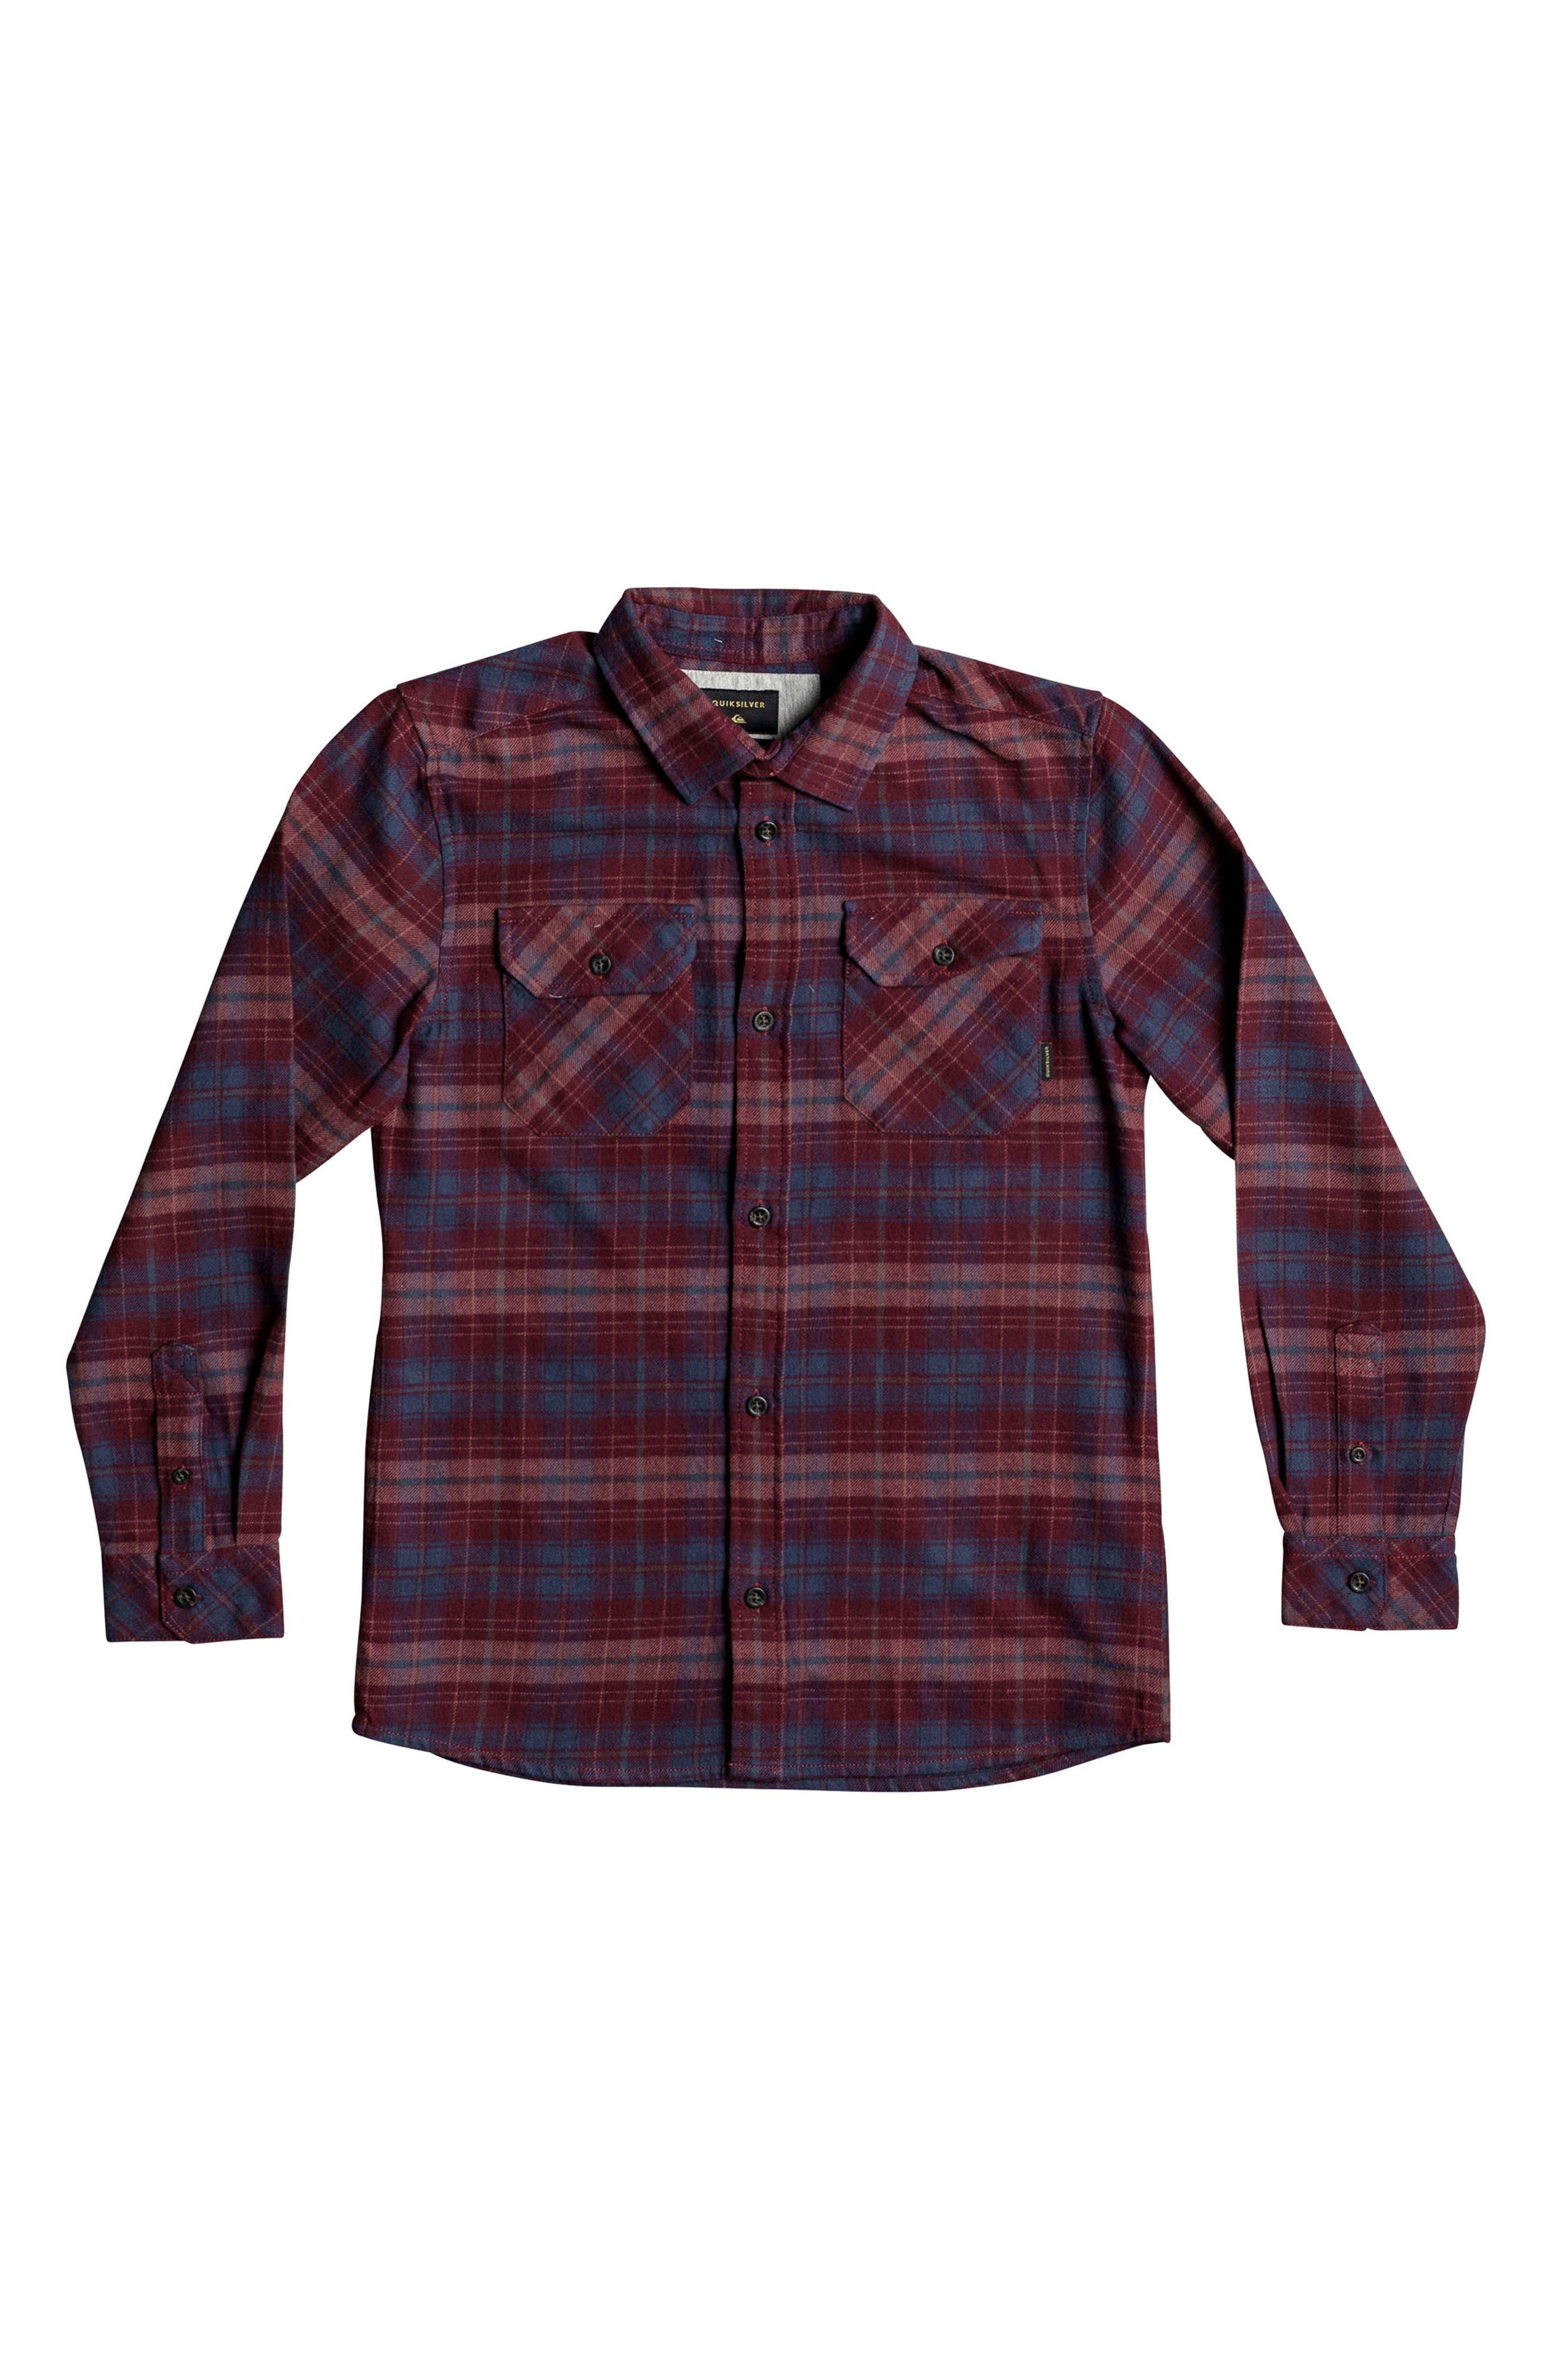 Quiksilver Fitzspeere Plaid Flannel Shirt (Big Boys)